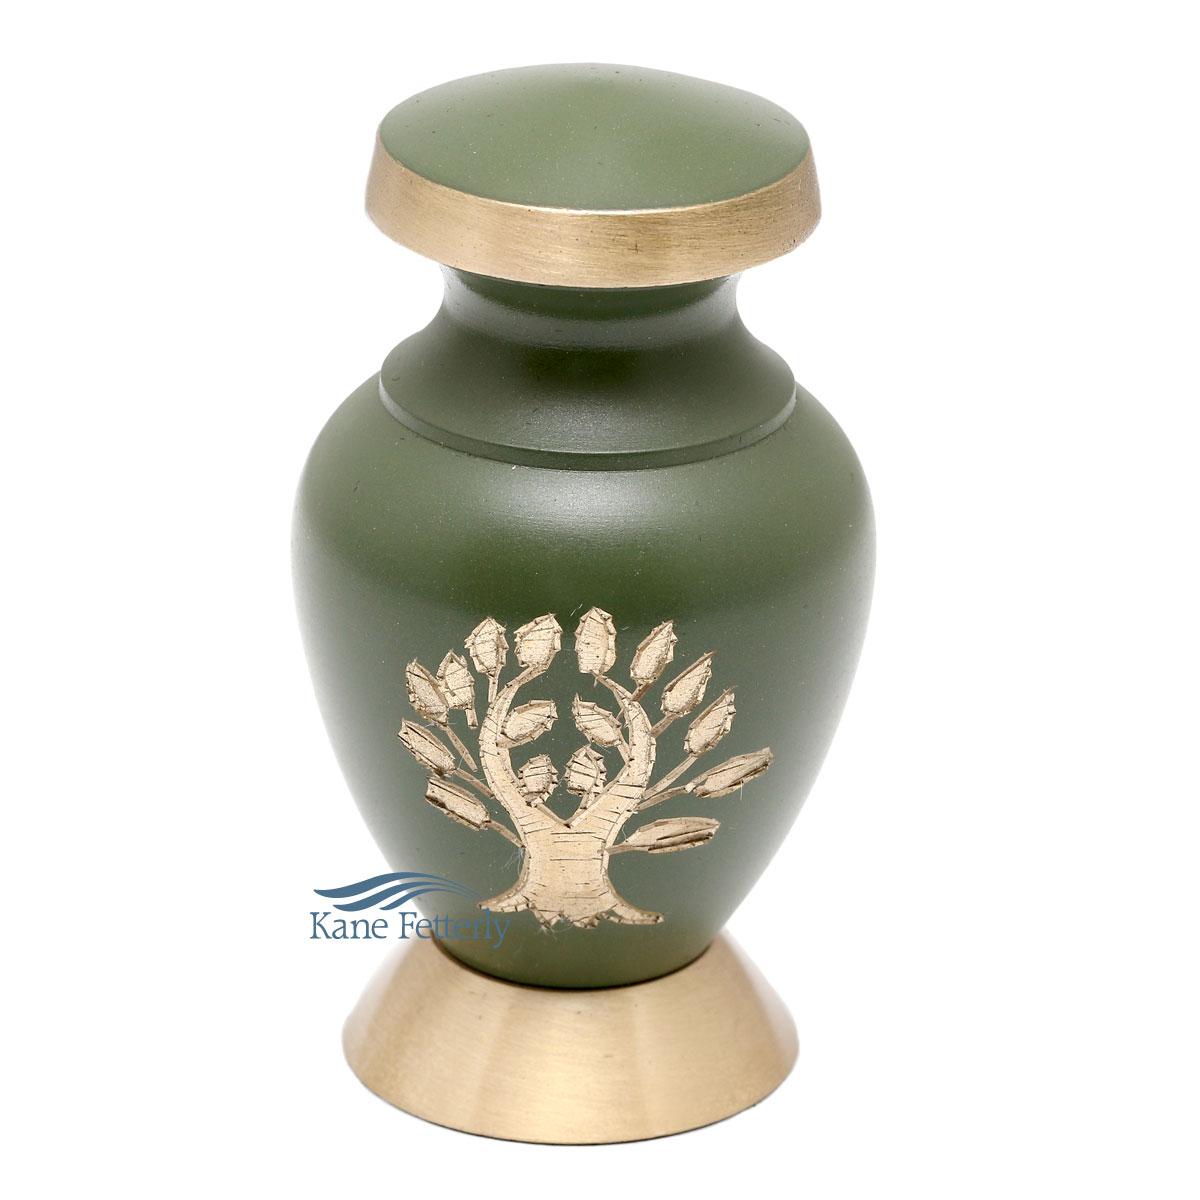 U86459K Brass miniature urn